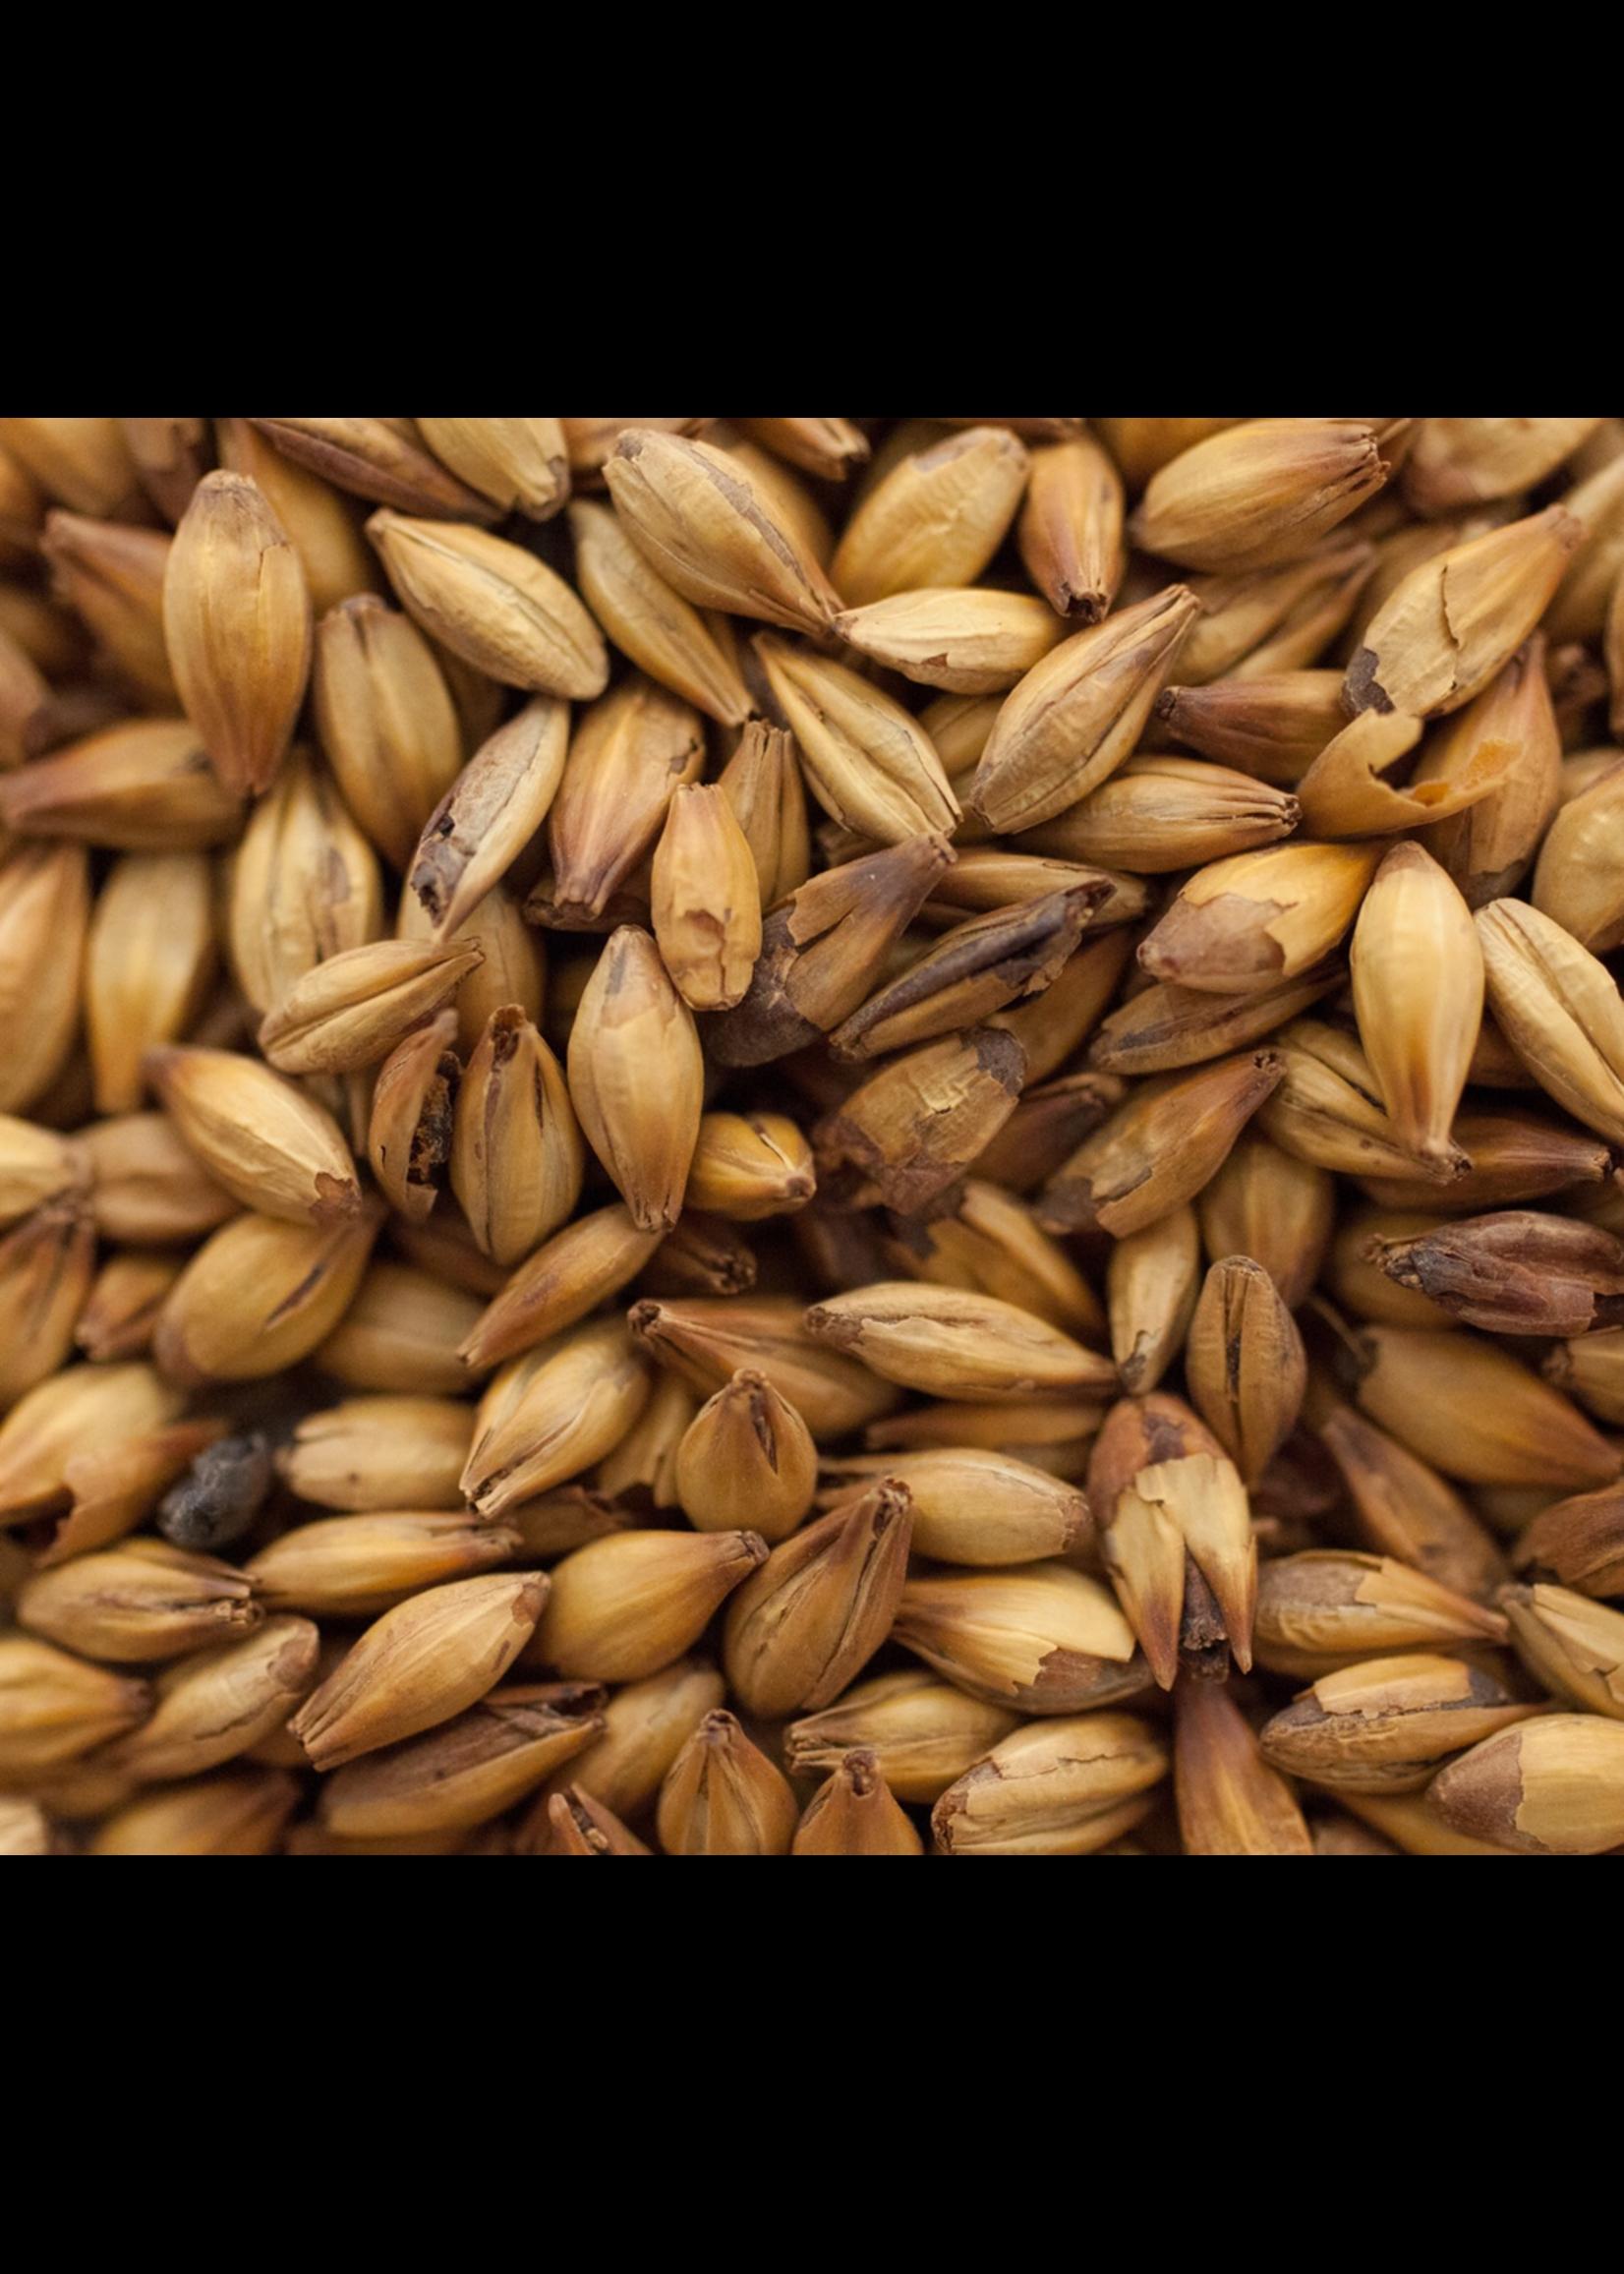 Grain Malteries Franco-Belges Caramel Munich 60 Malt - B14  - 1 LB